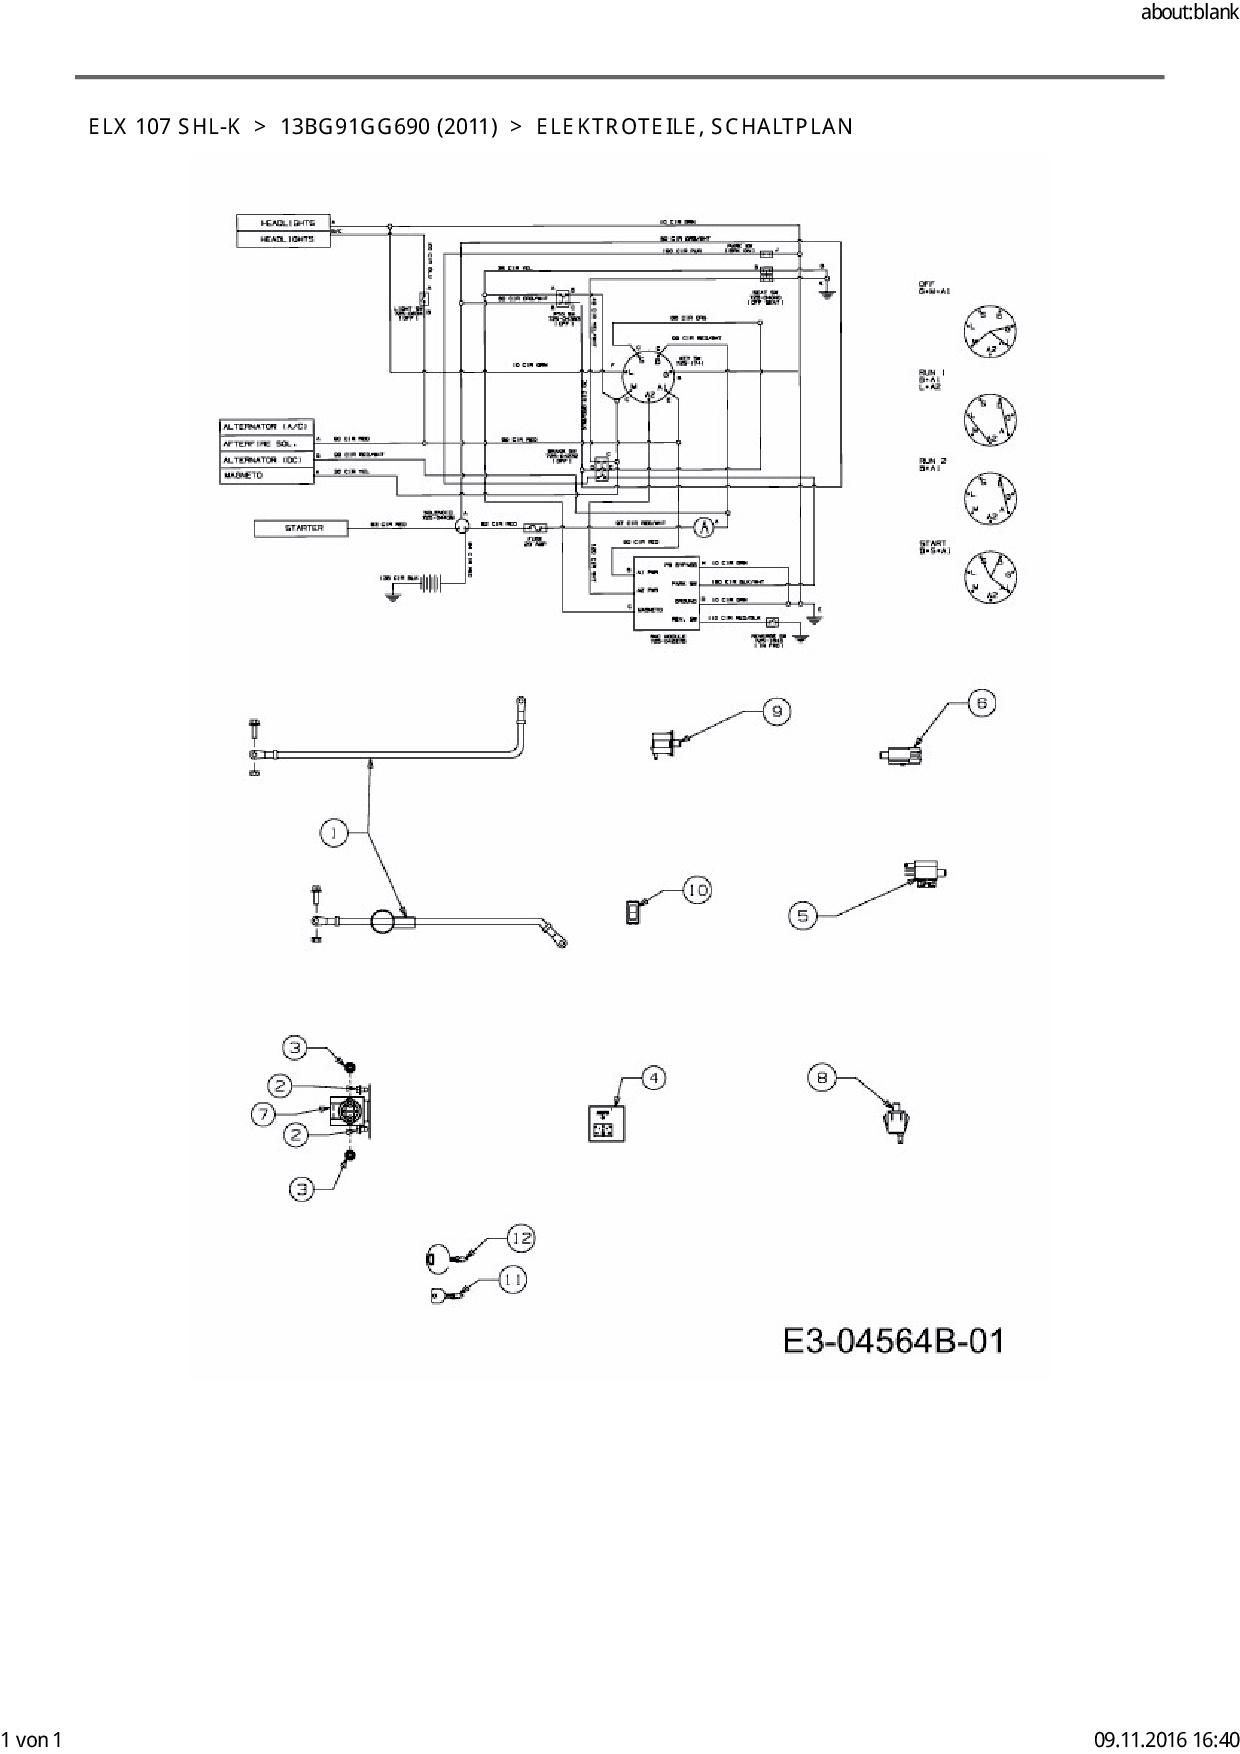 Beste Schaltuhr Schaltplan Galerie - Elektrische Schaltplan-Ideen ...